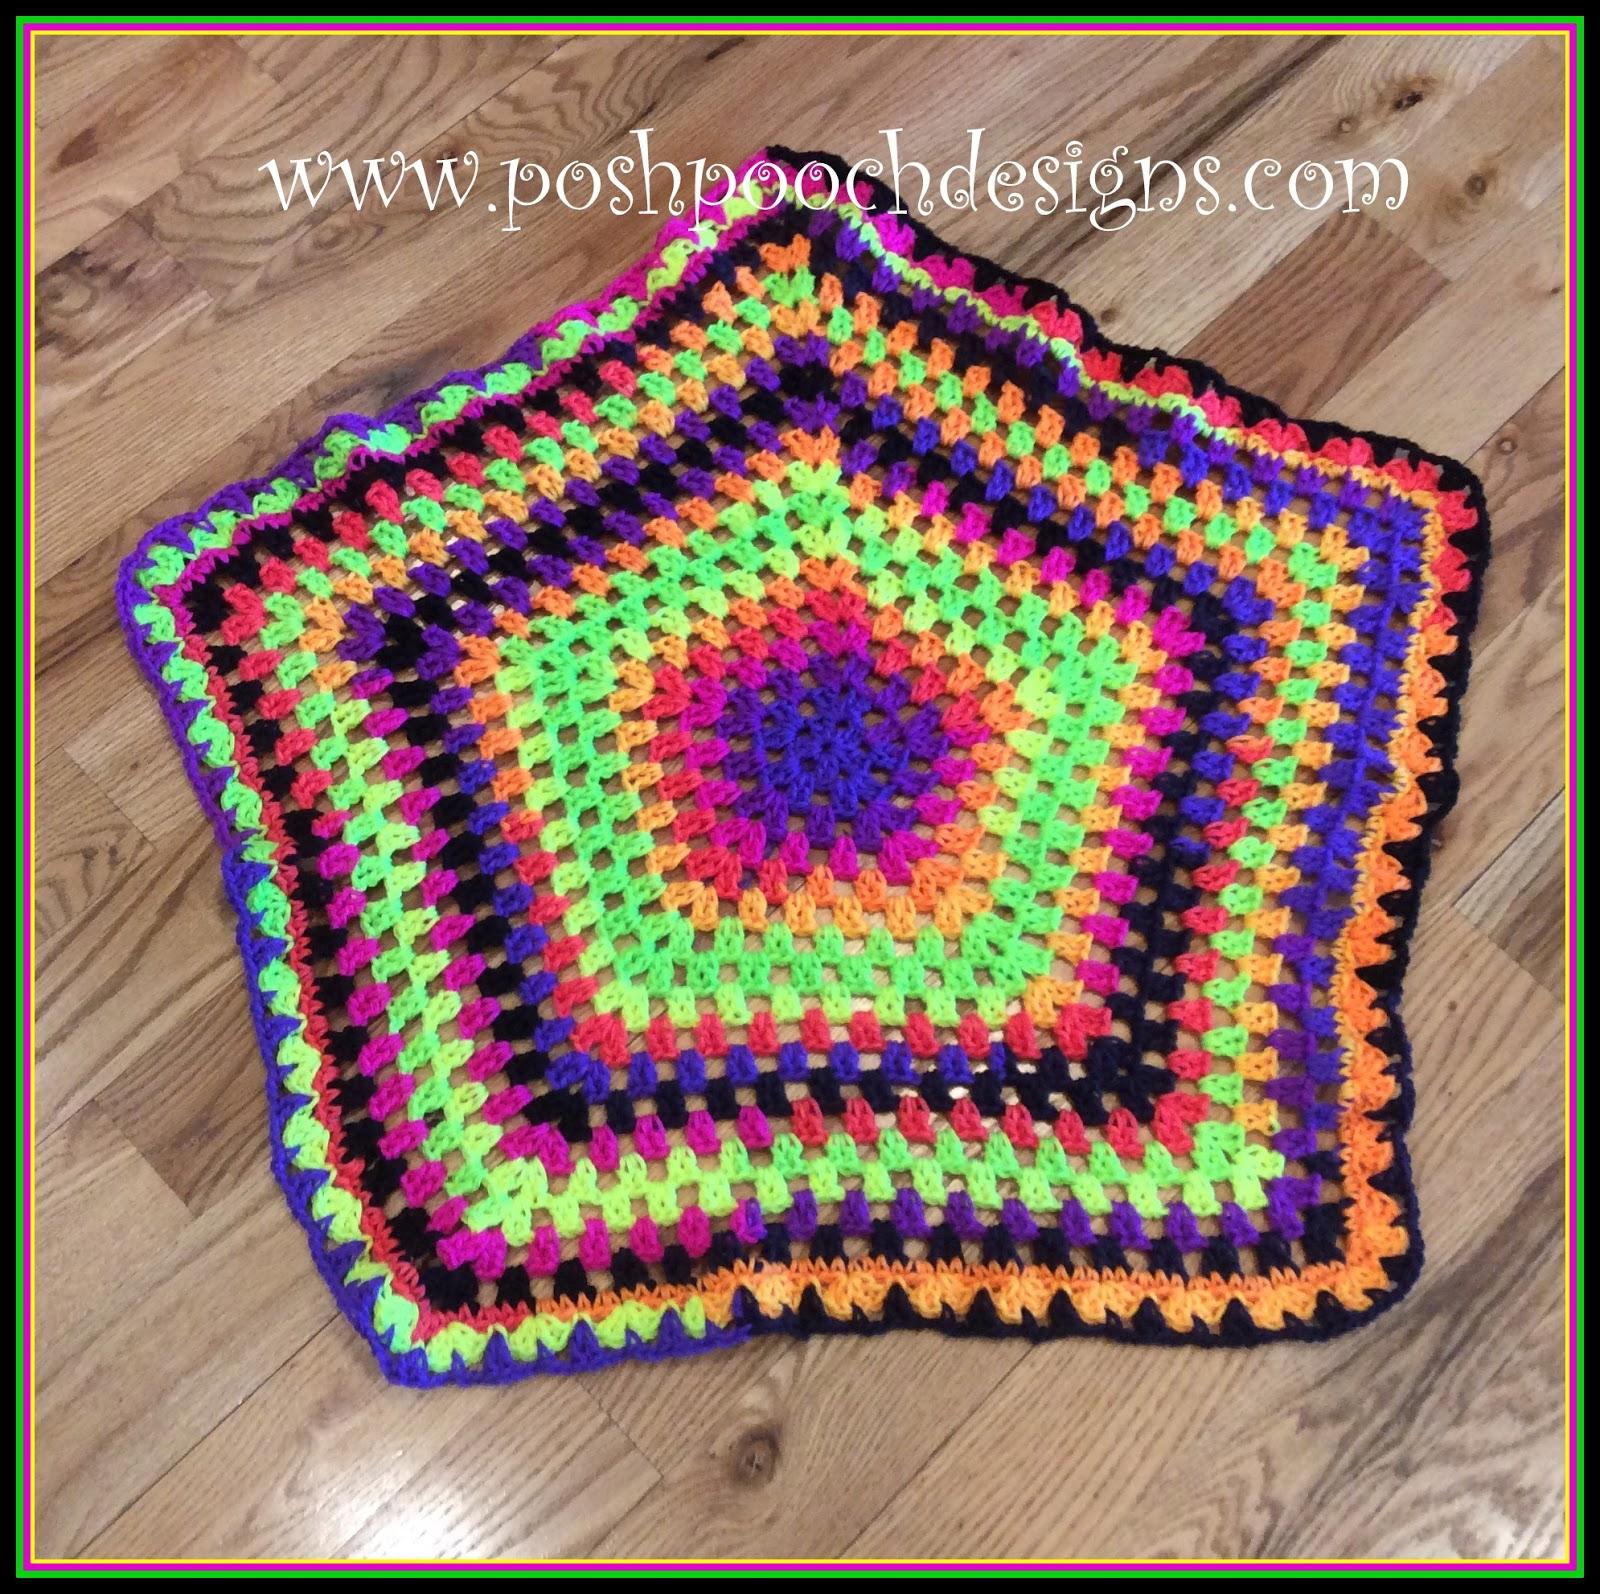 Posh Pooch Designs Dog Clothes: Swirling Rainbow Blanket Crochet ...